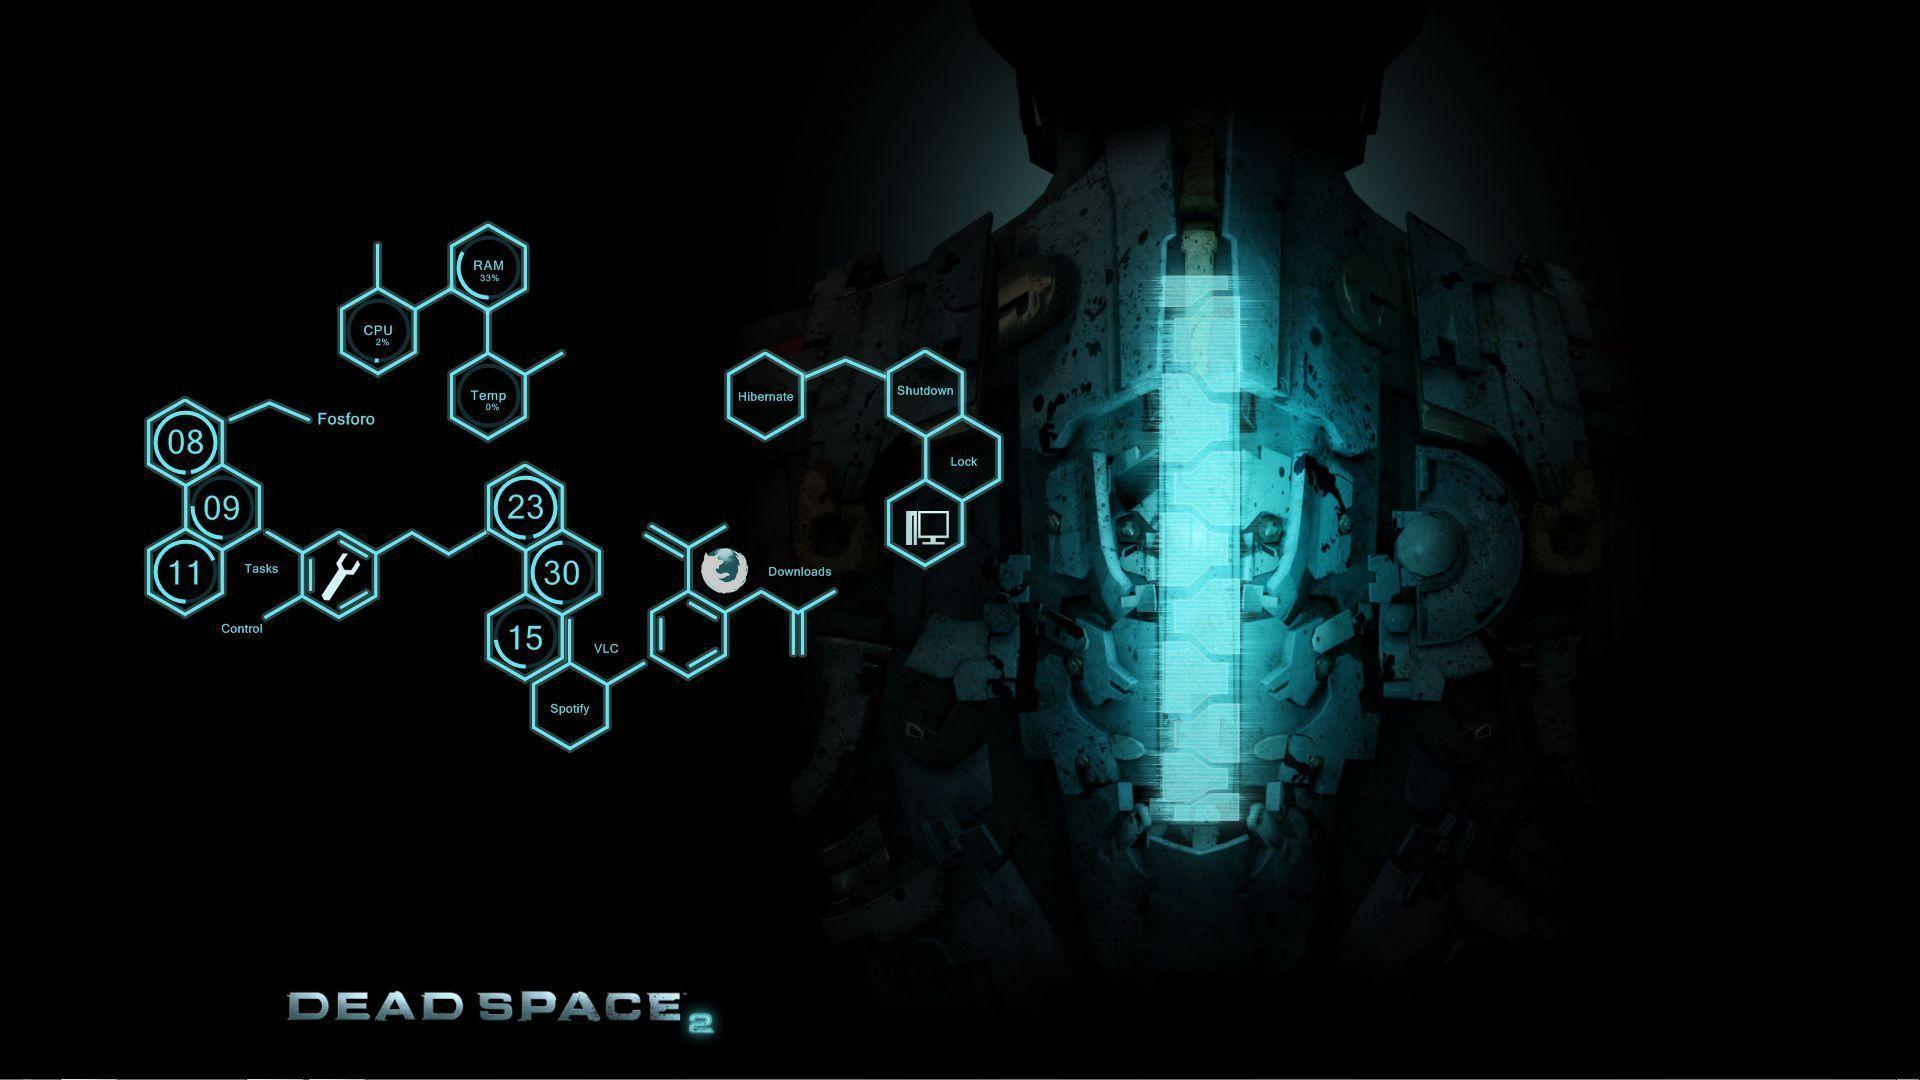 Dead Space HD Wallpapers